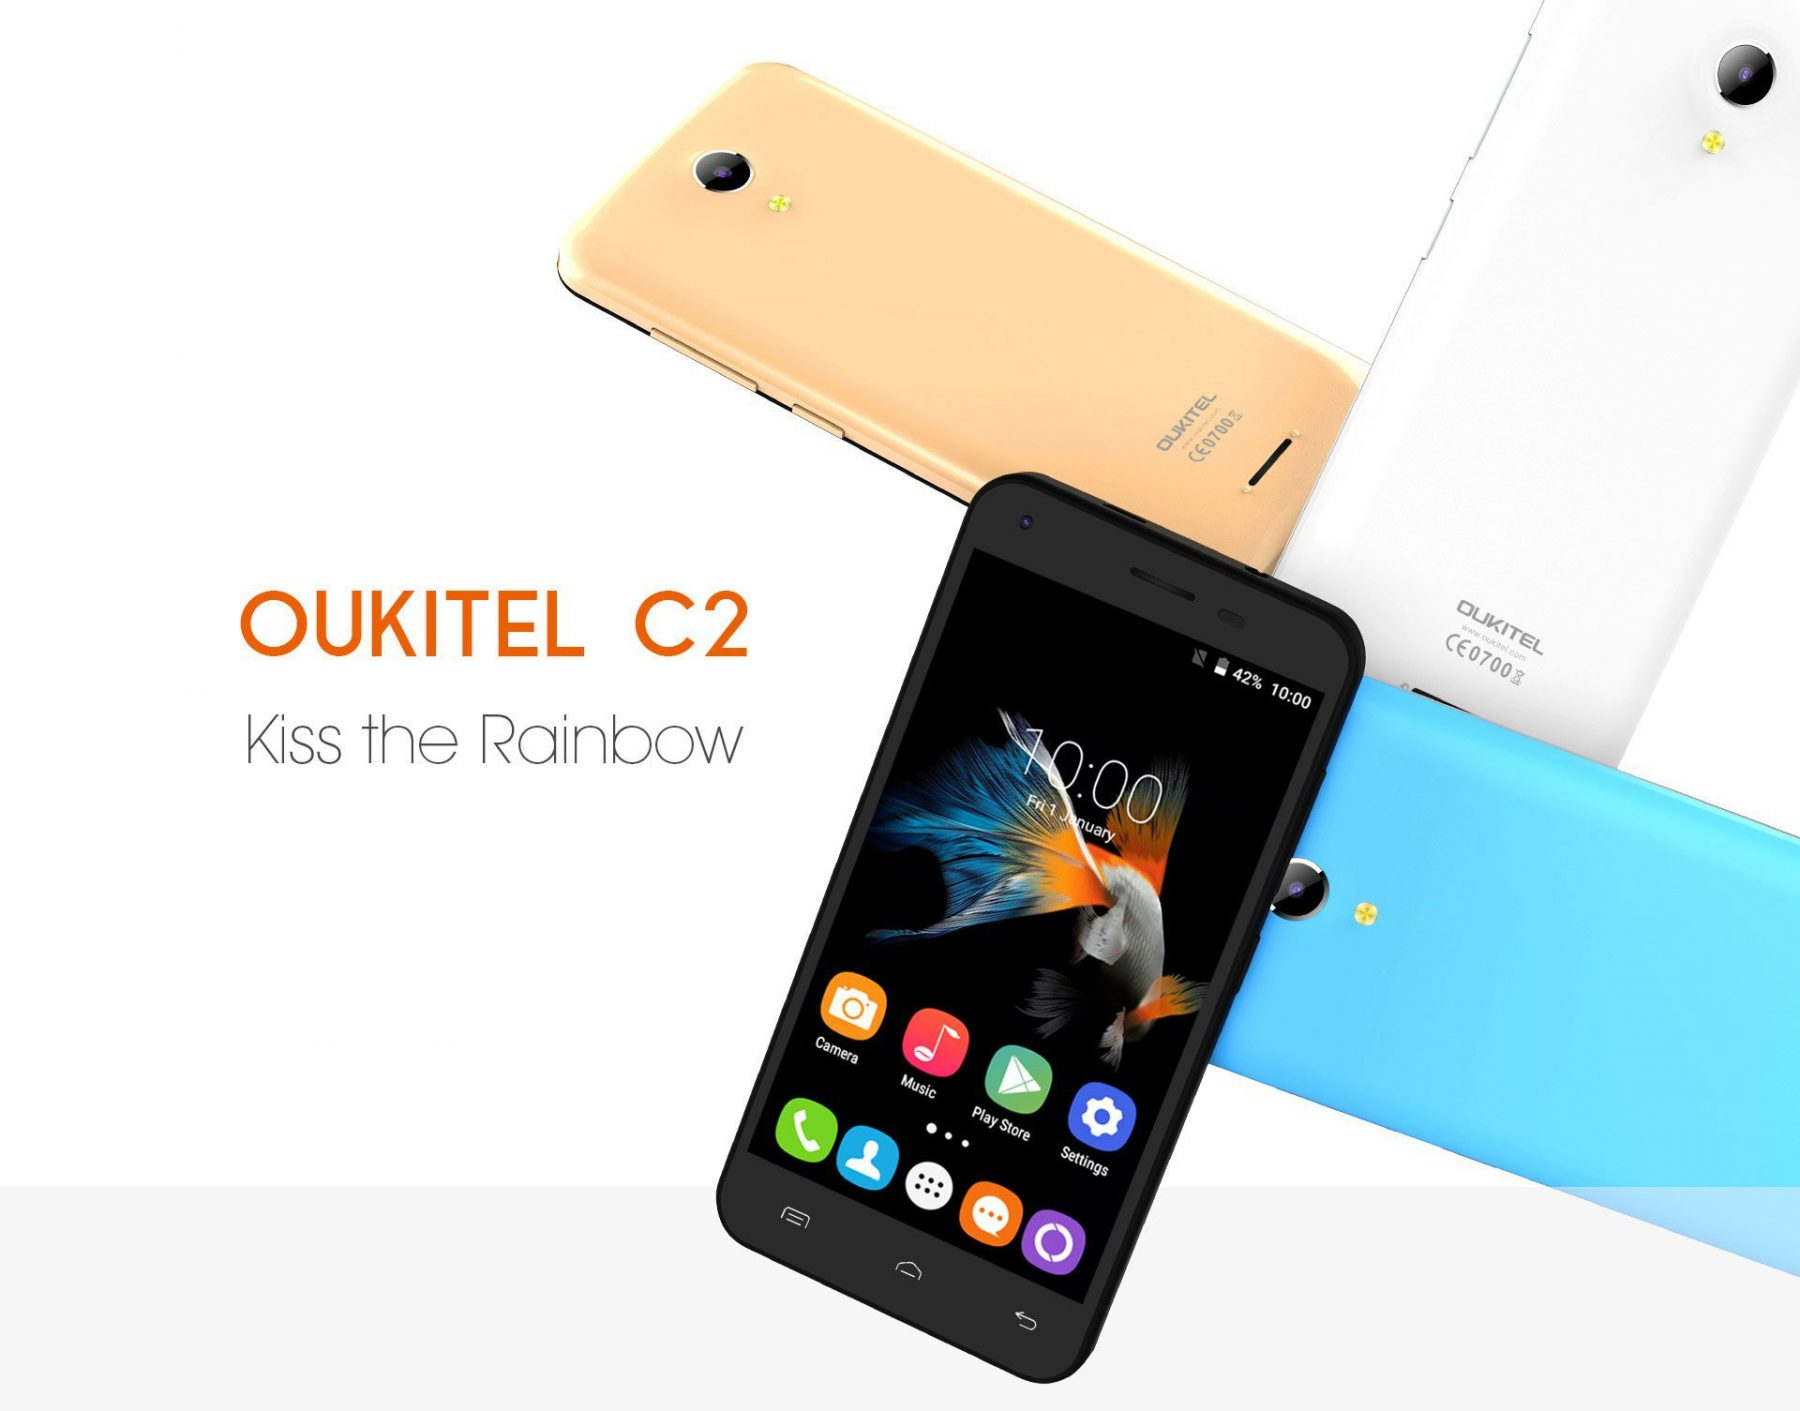 Oukitel C2